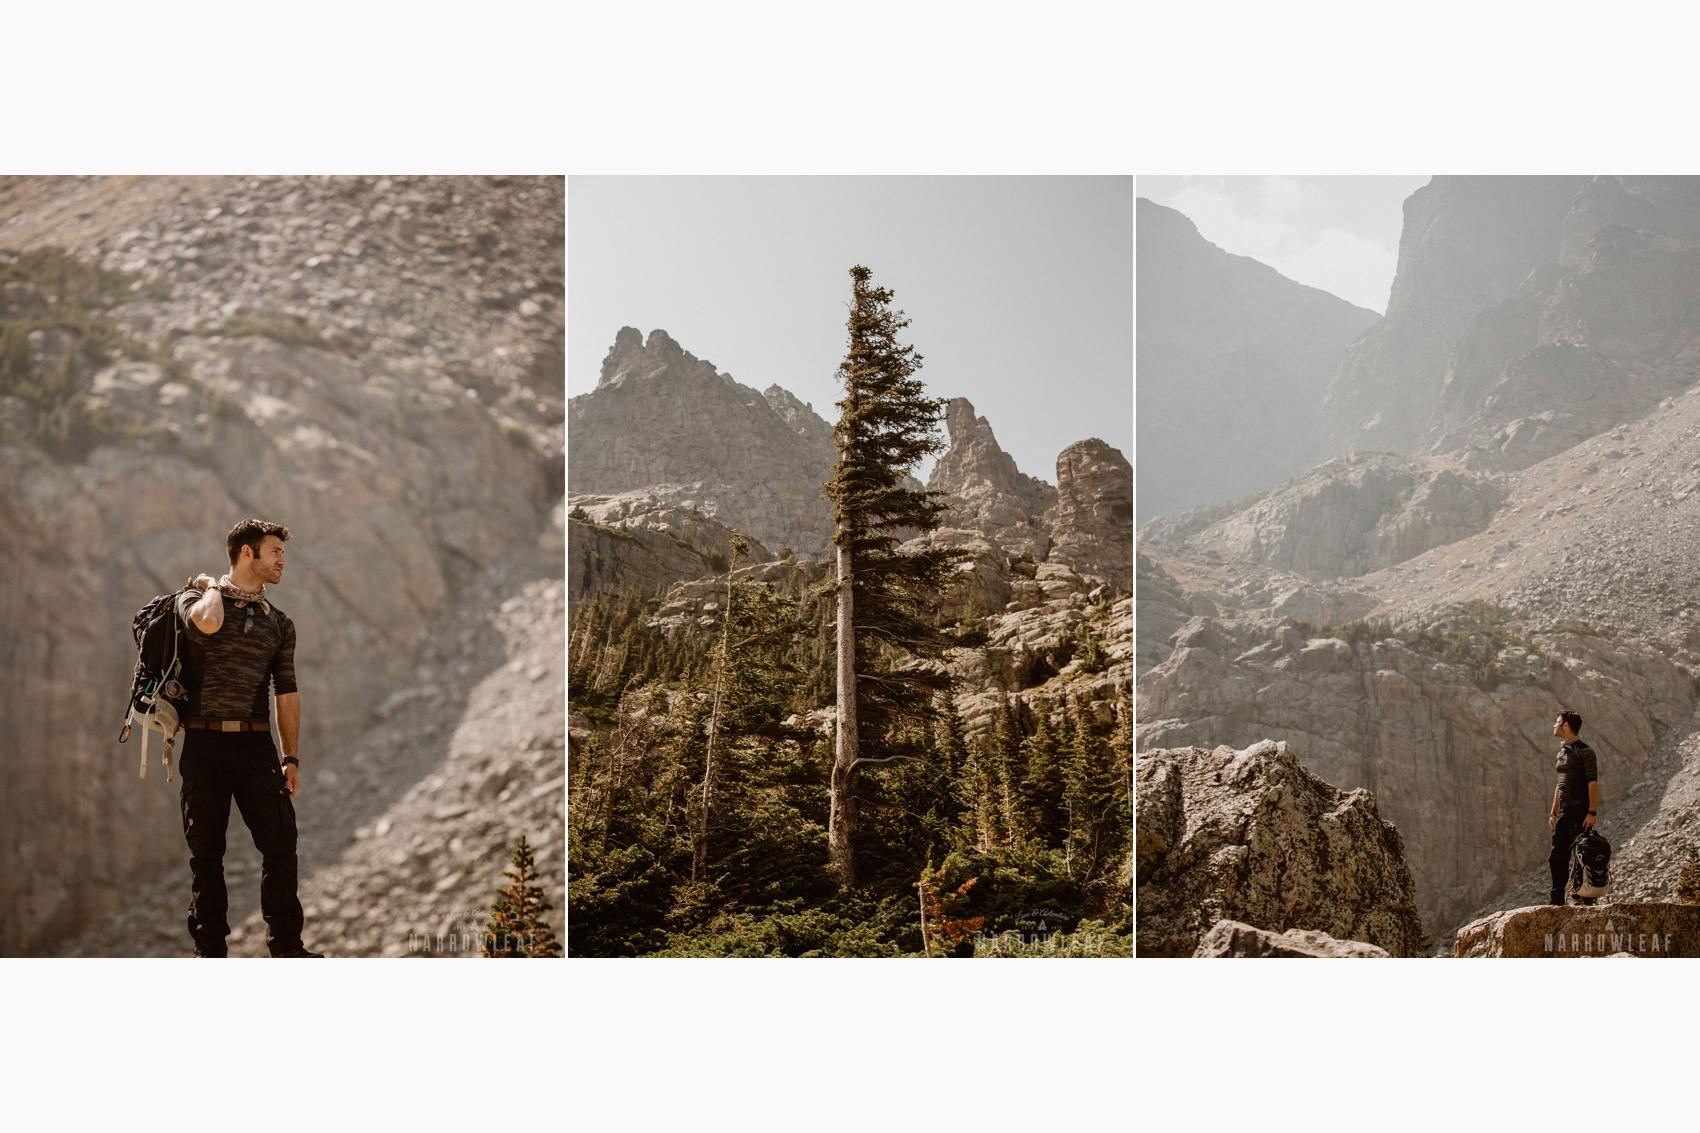 hiking-adventure-photographer-narrowleaf-photography007-008.jpg